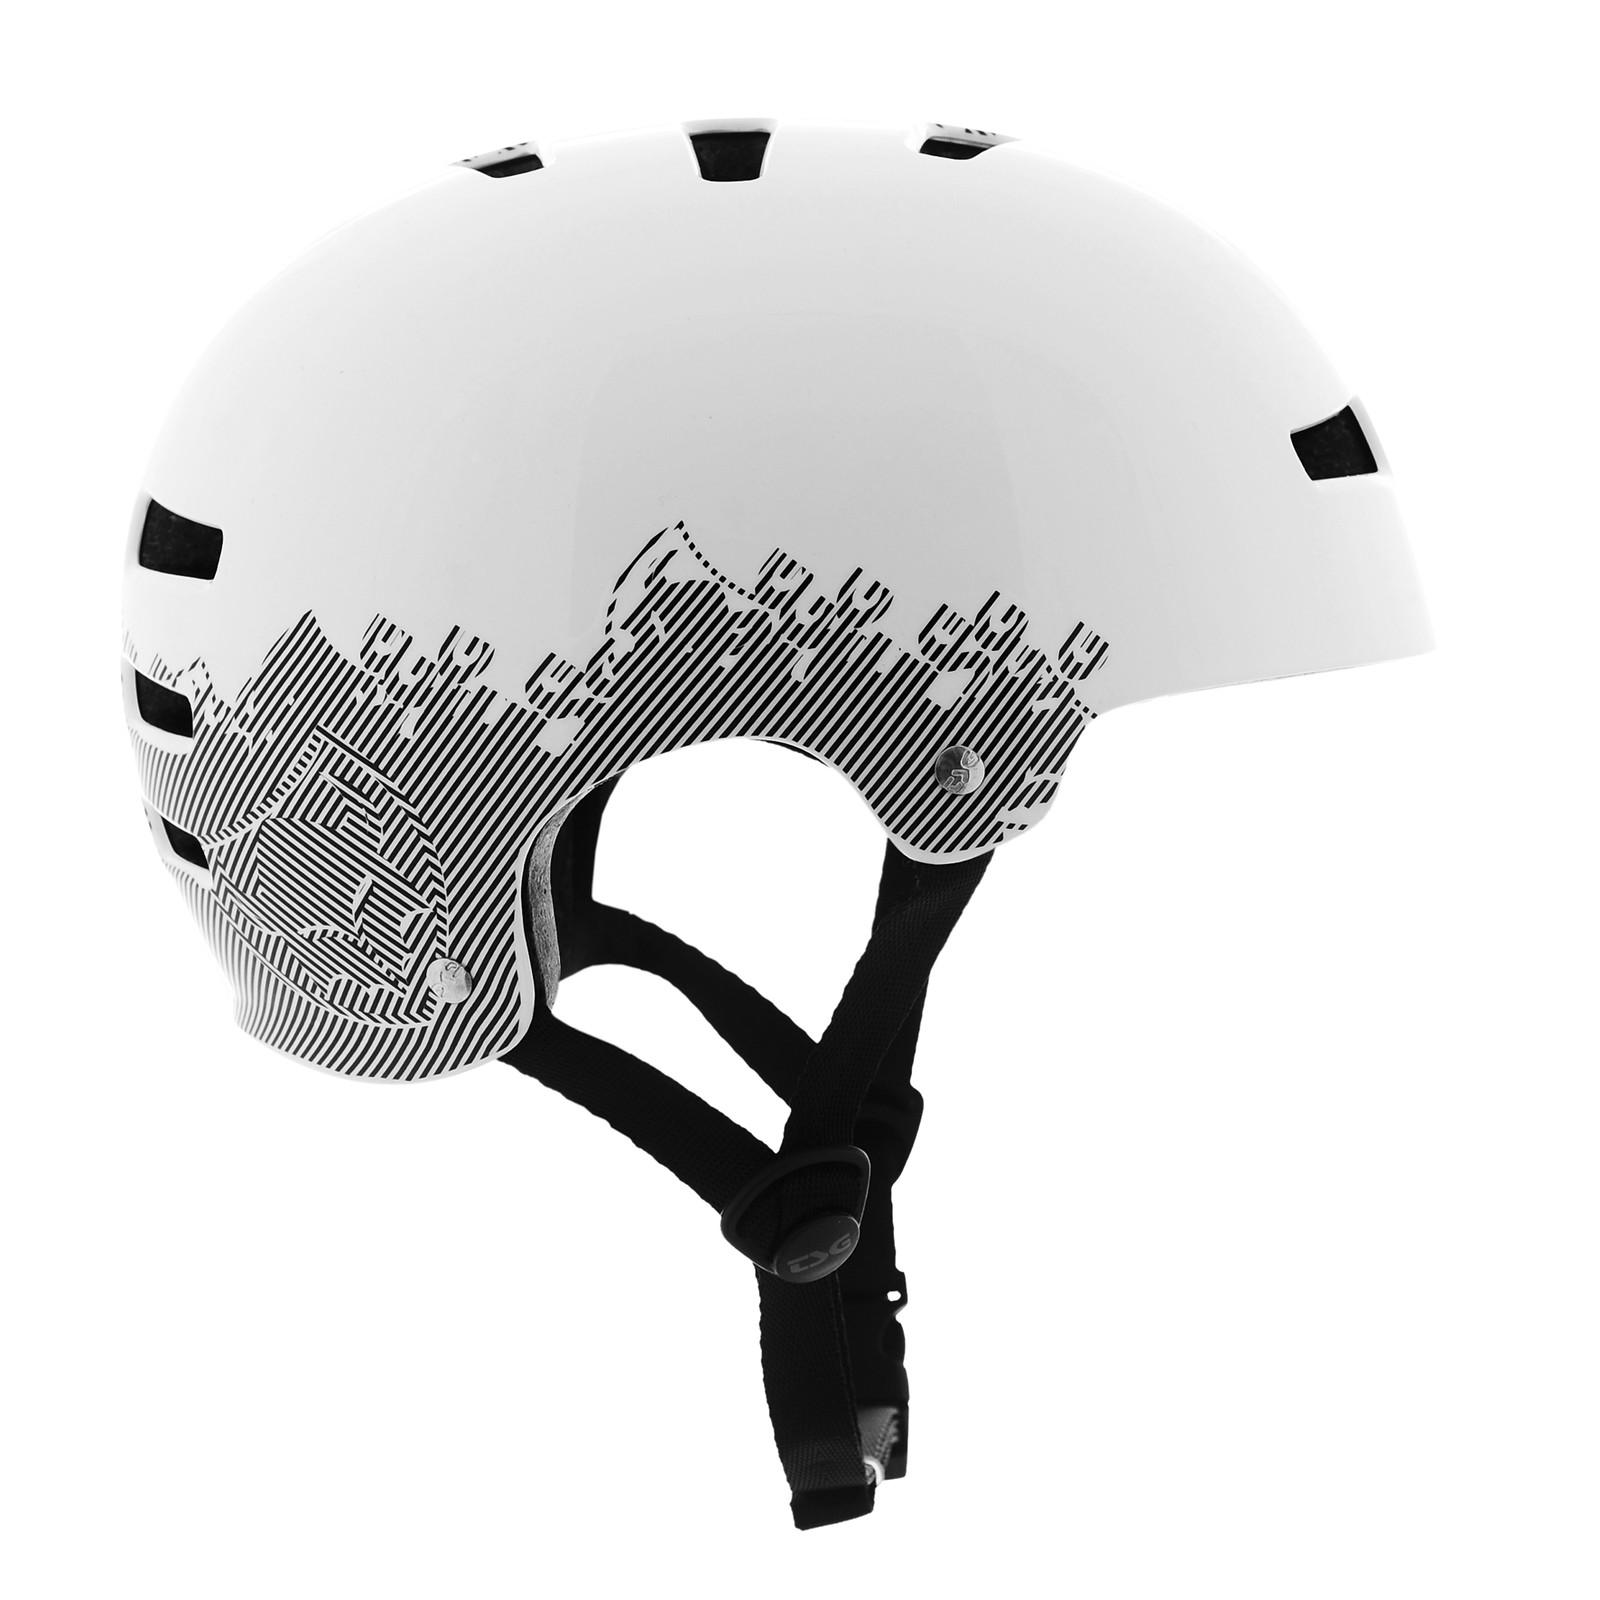 TSG-Evolution-Graphic-Amblyopia - Sidewall Distribution - Mountain Biking Pictures - Vital MTB